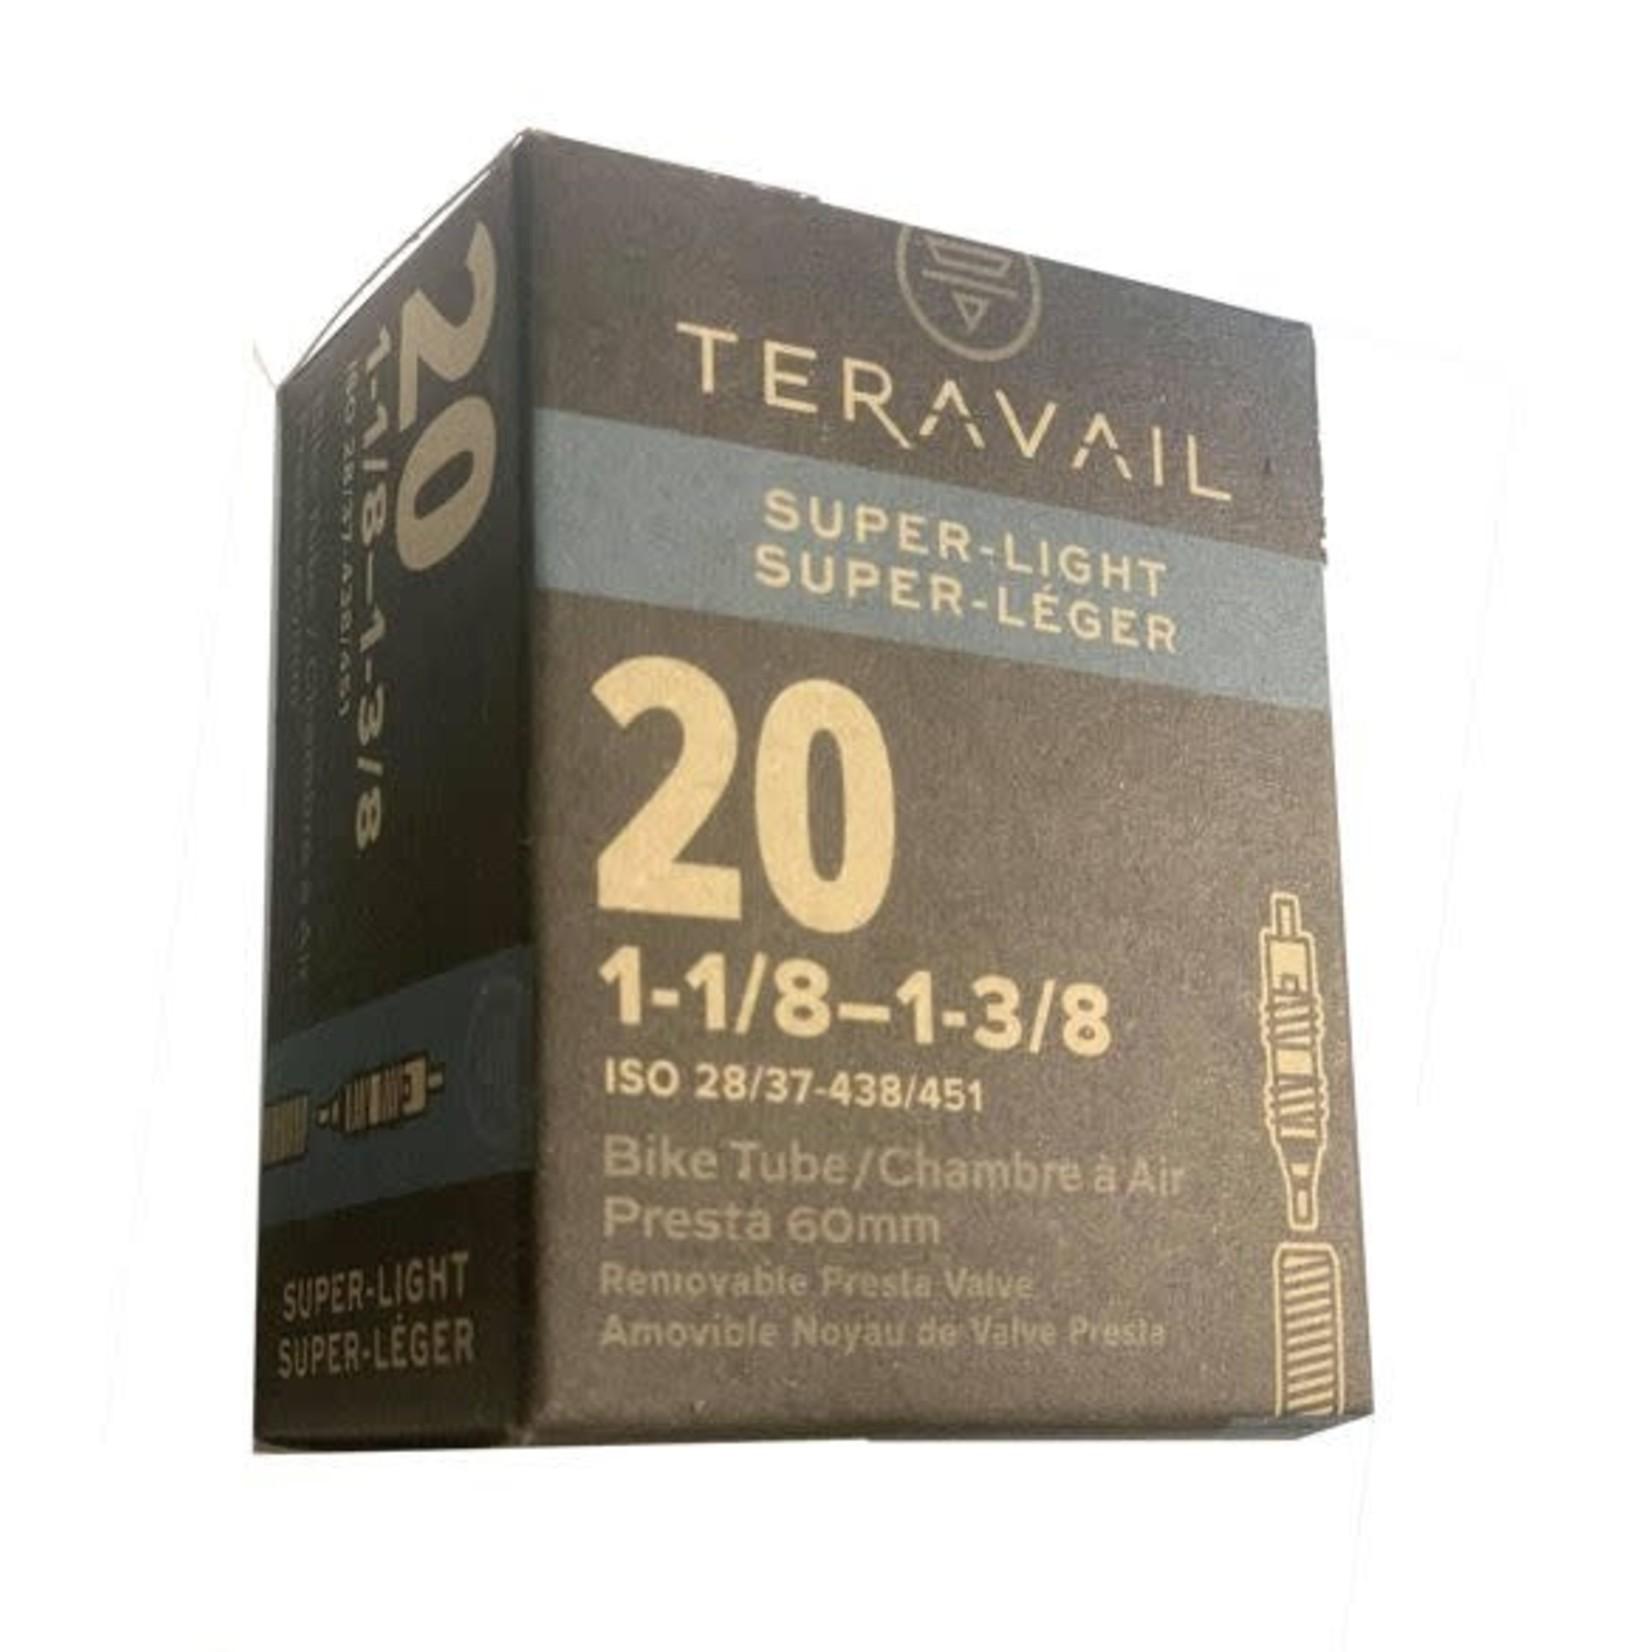 "Teravail Superlight 20x 1-1/8""-1-3/8""  60mm PV"